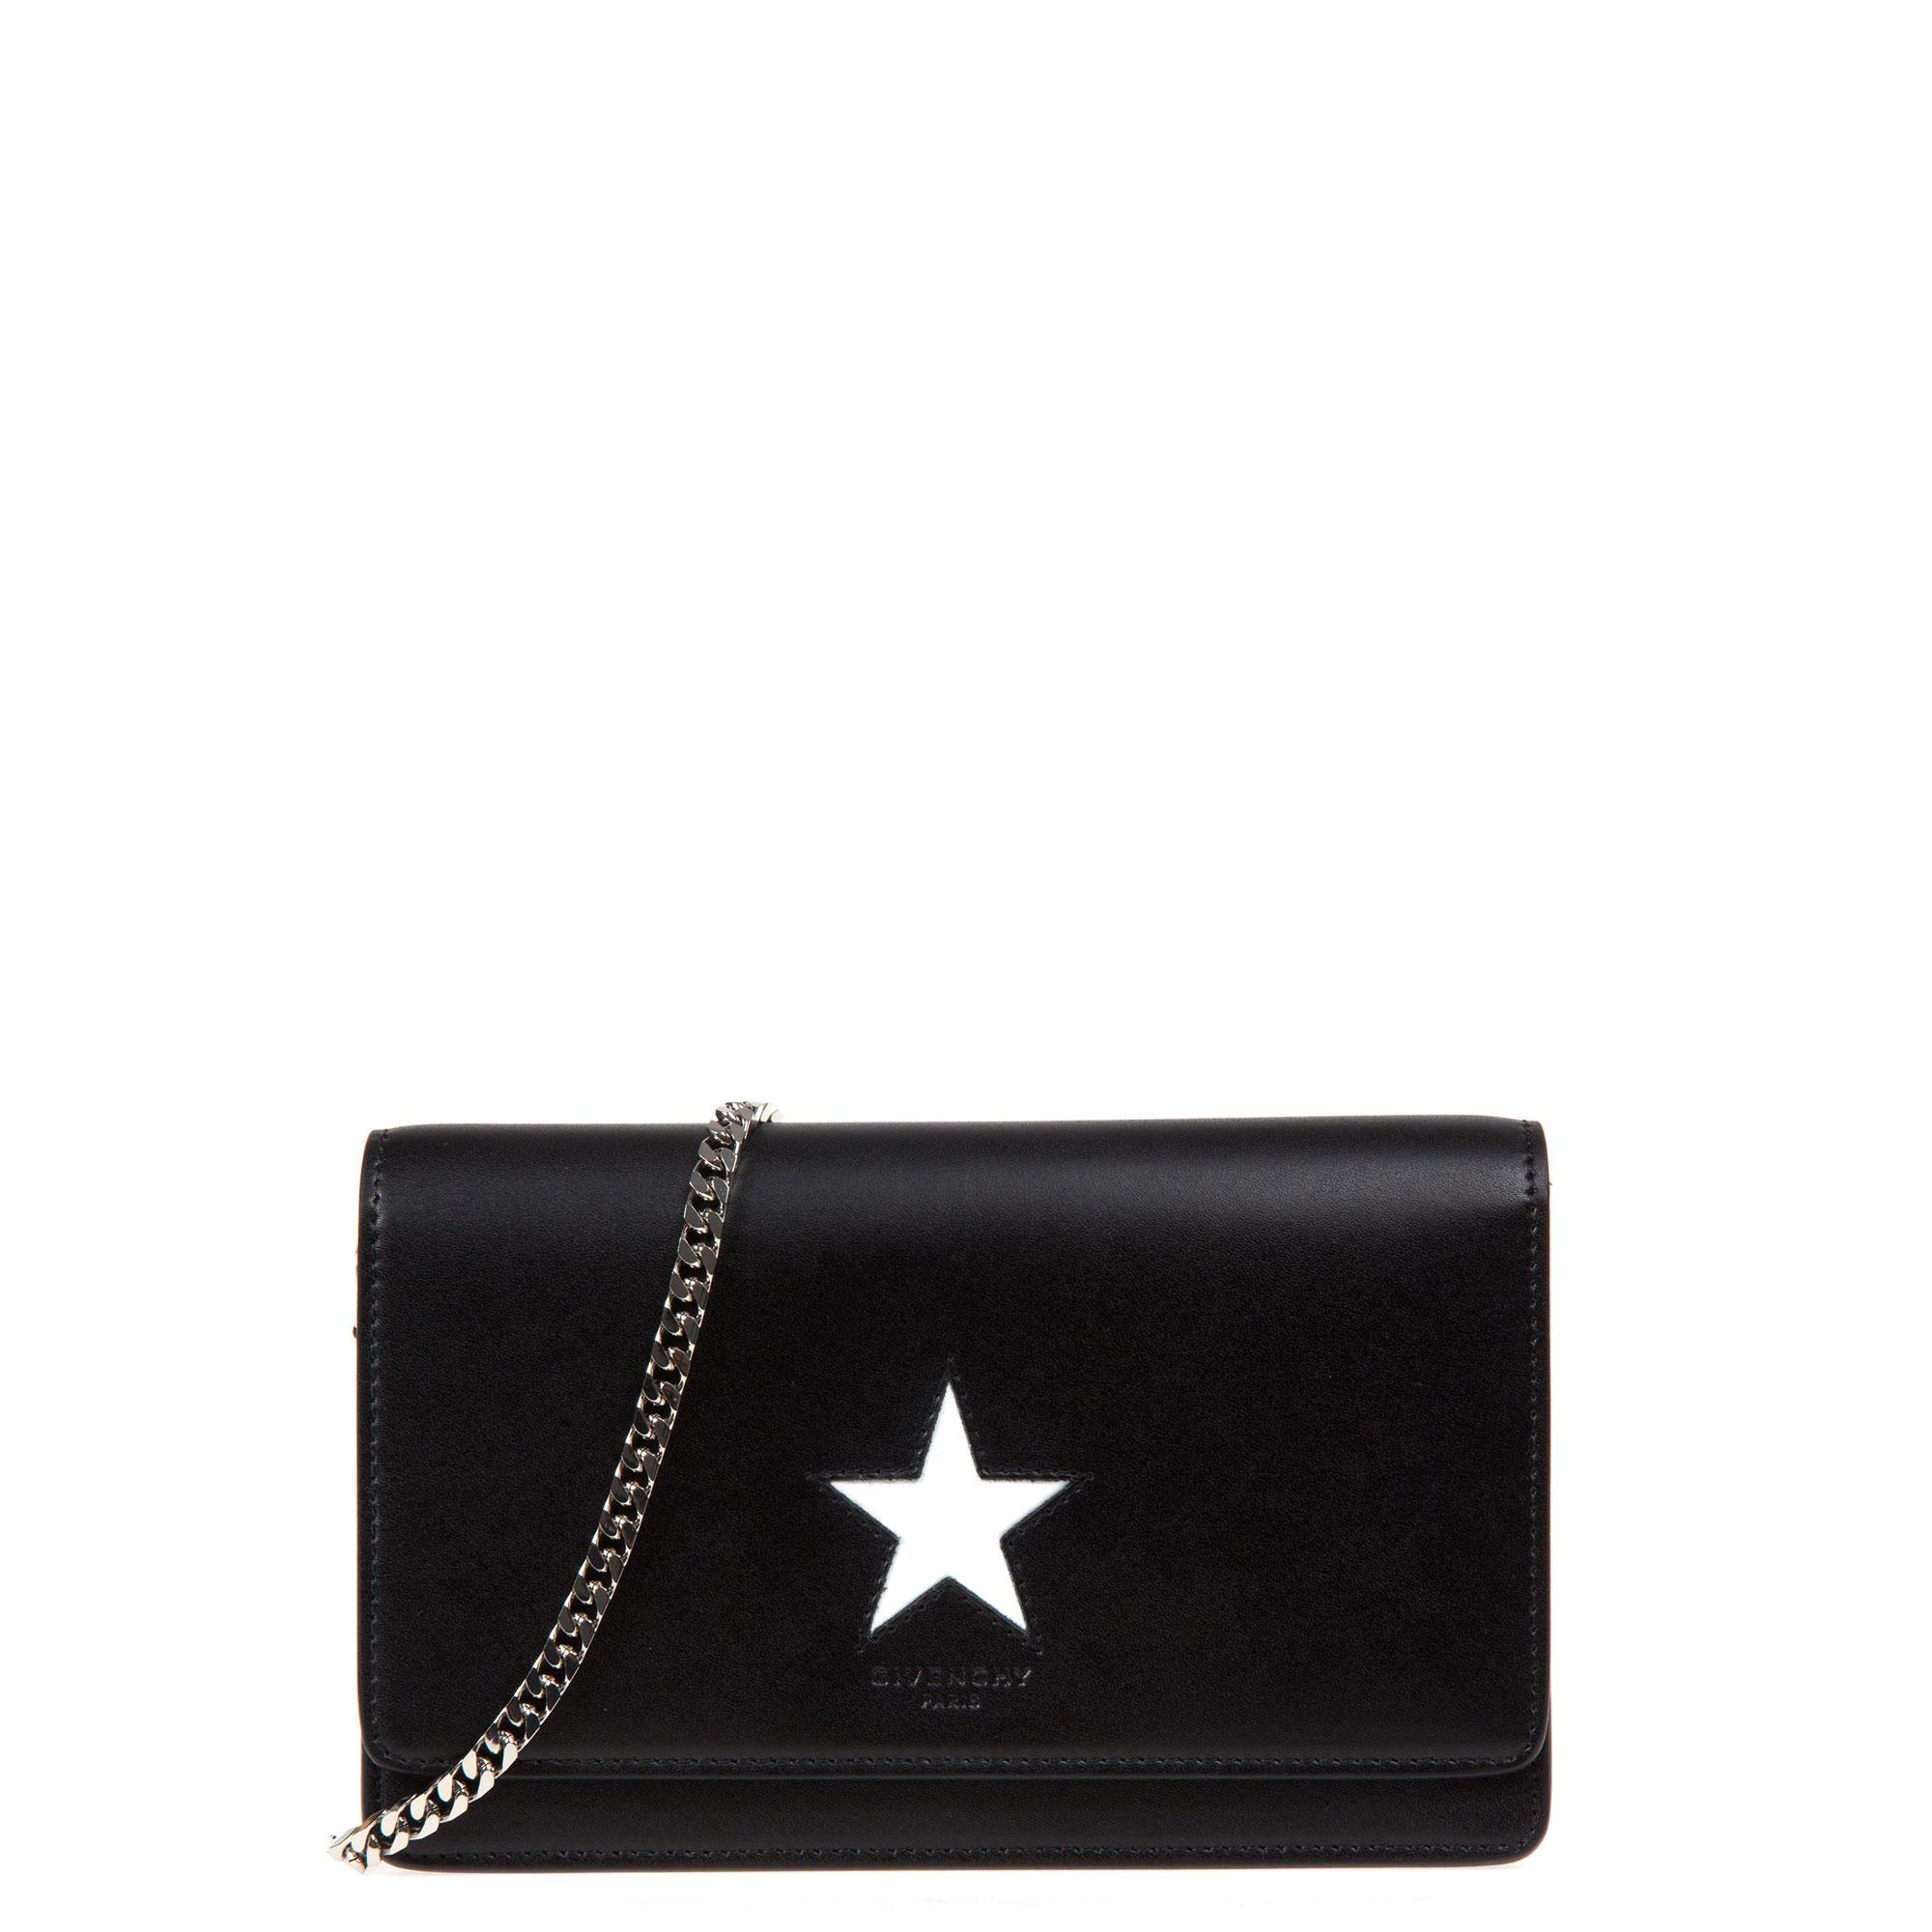 d94fb73fa8ad Lyst - Givenchy Pandora-chain Mini Clutch in Black